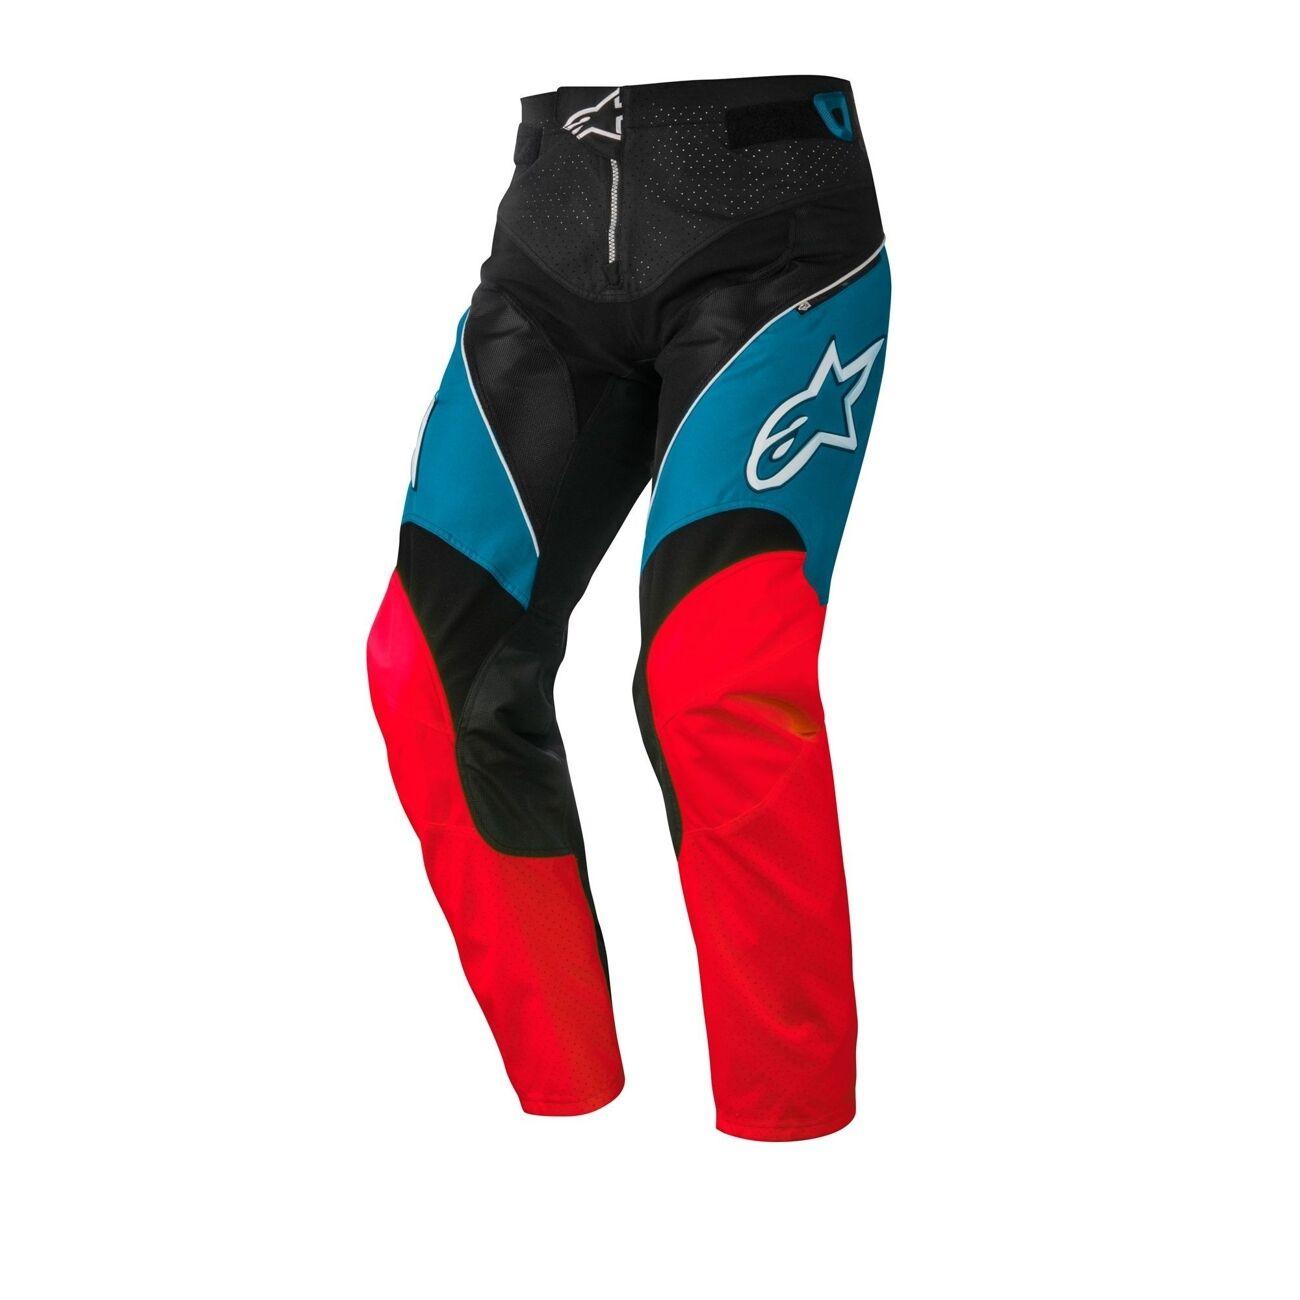 Alpinestars A-Line 2 0 Downhill Pants BMX MTB  PANTS blueE-Spicy orange  official authorization